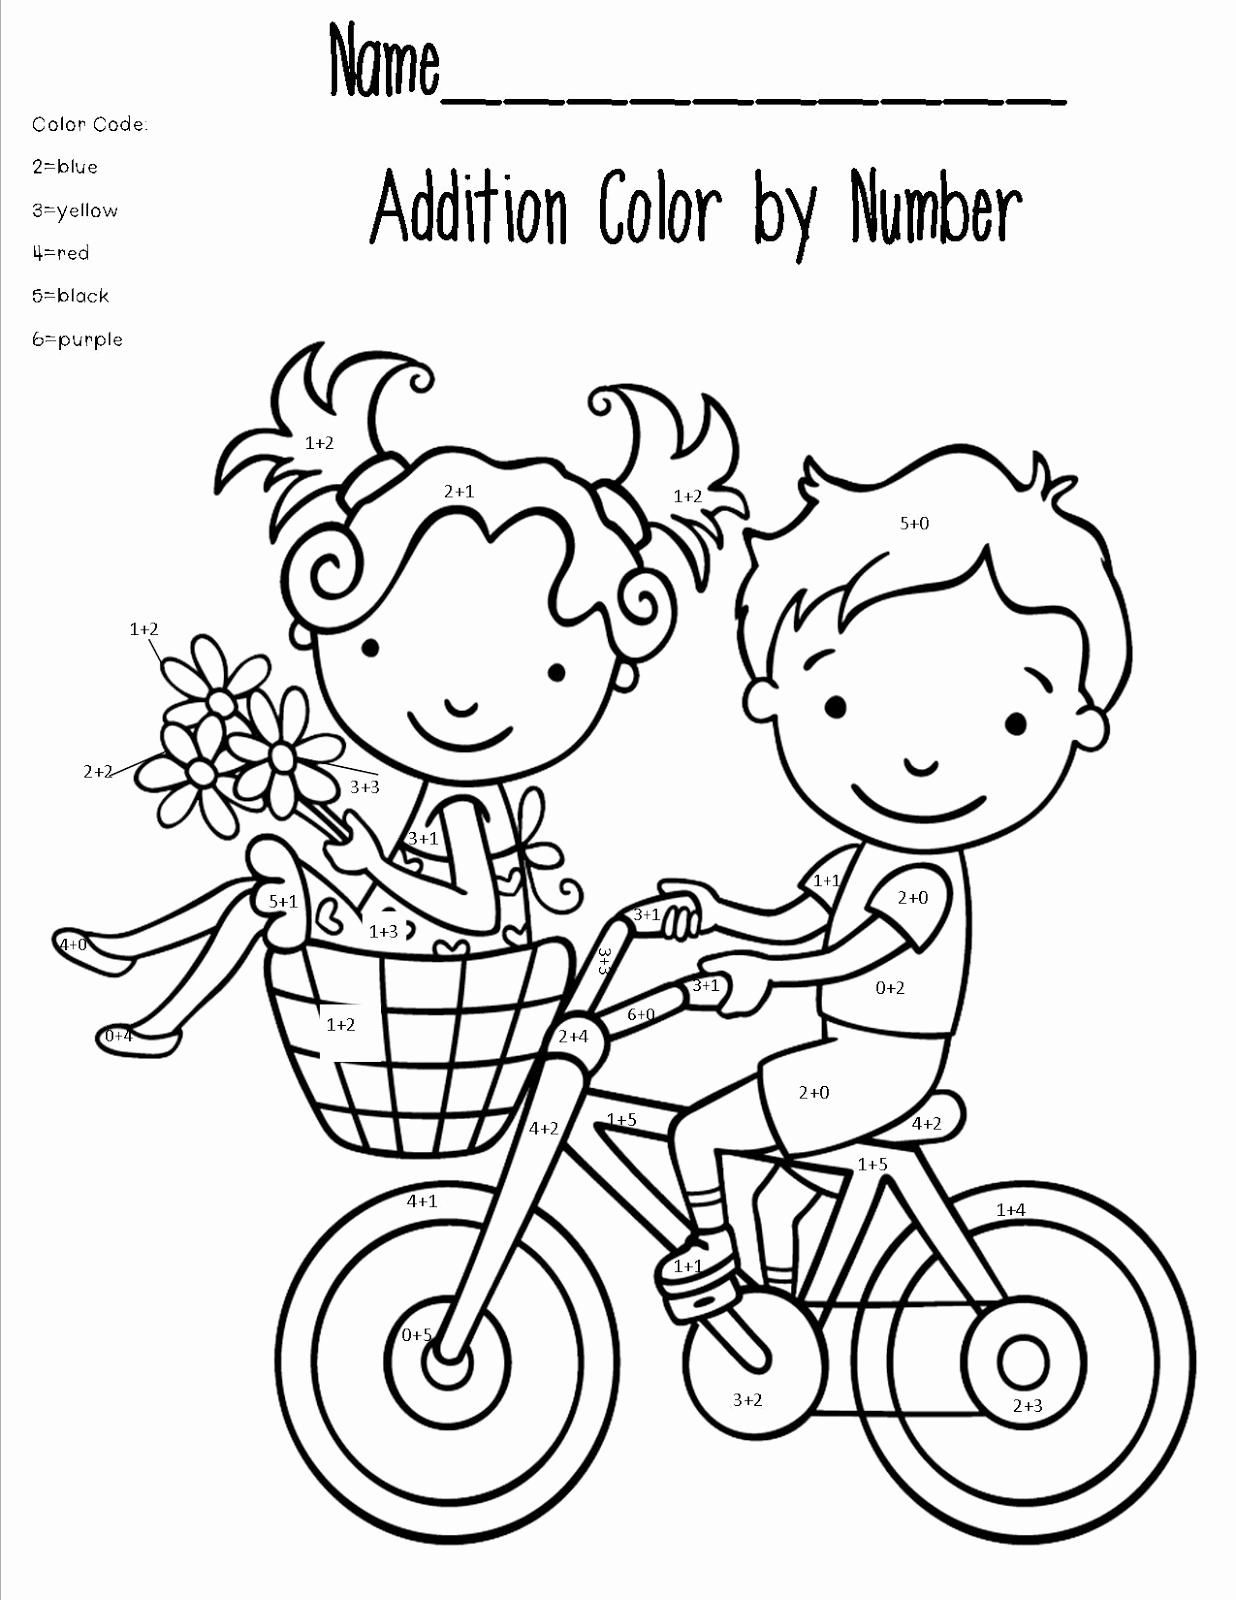 Coloring Addition Worksheet Elegant Free Printable Math Coloring Pages for Kids Best